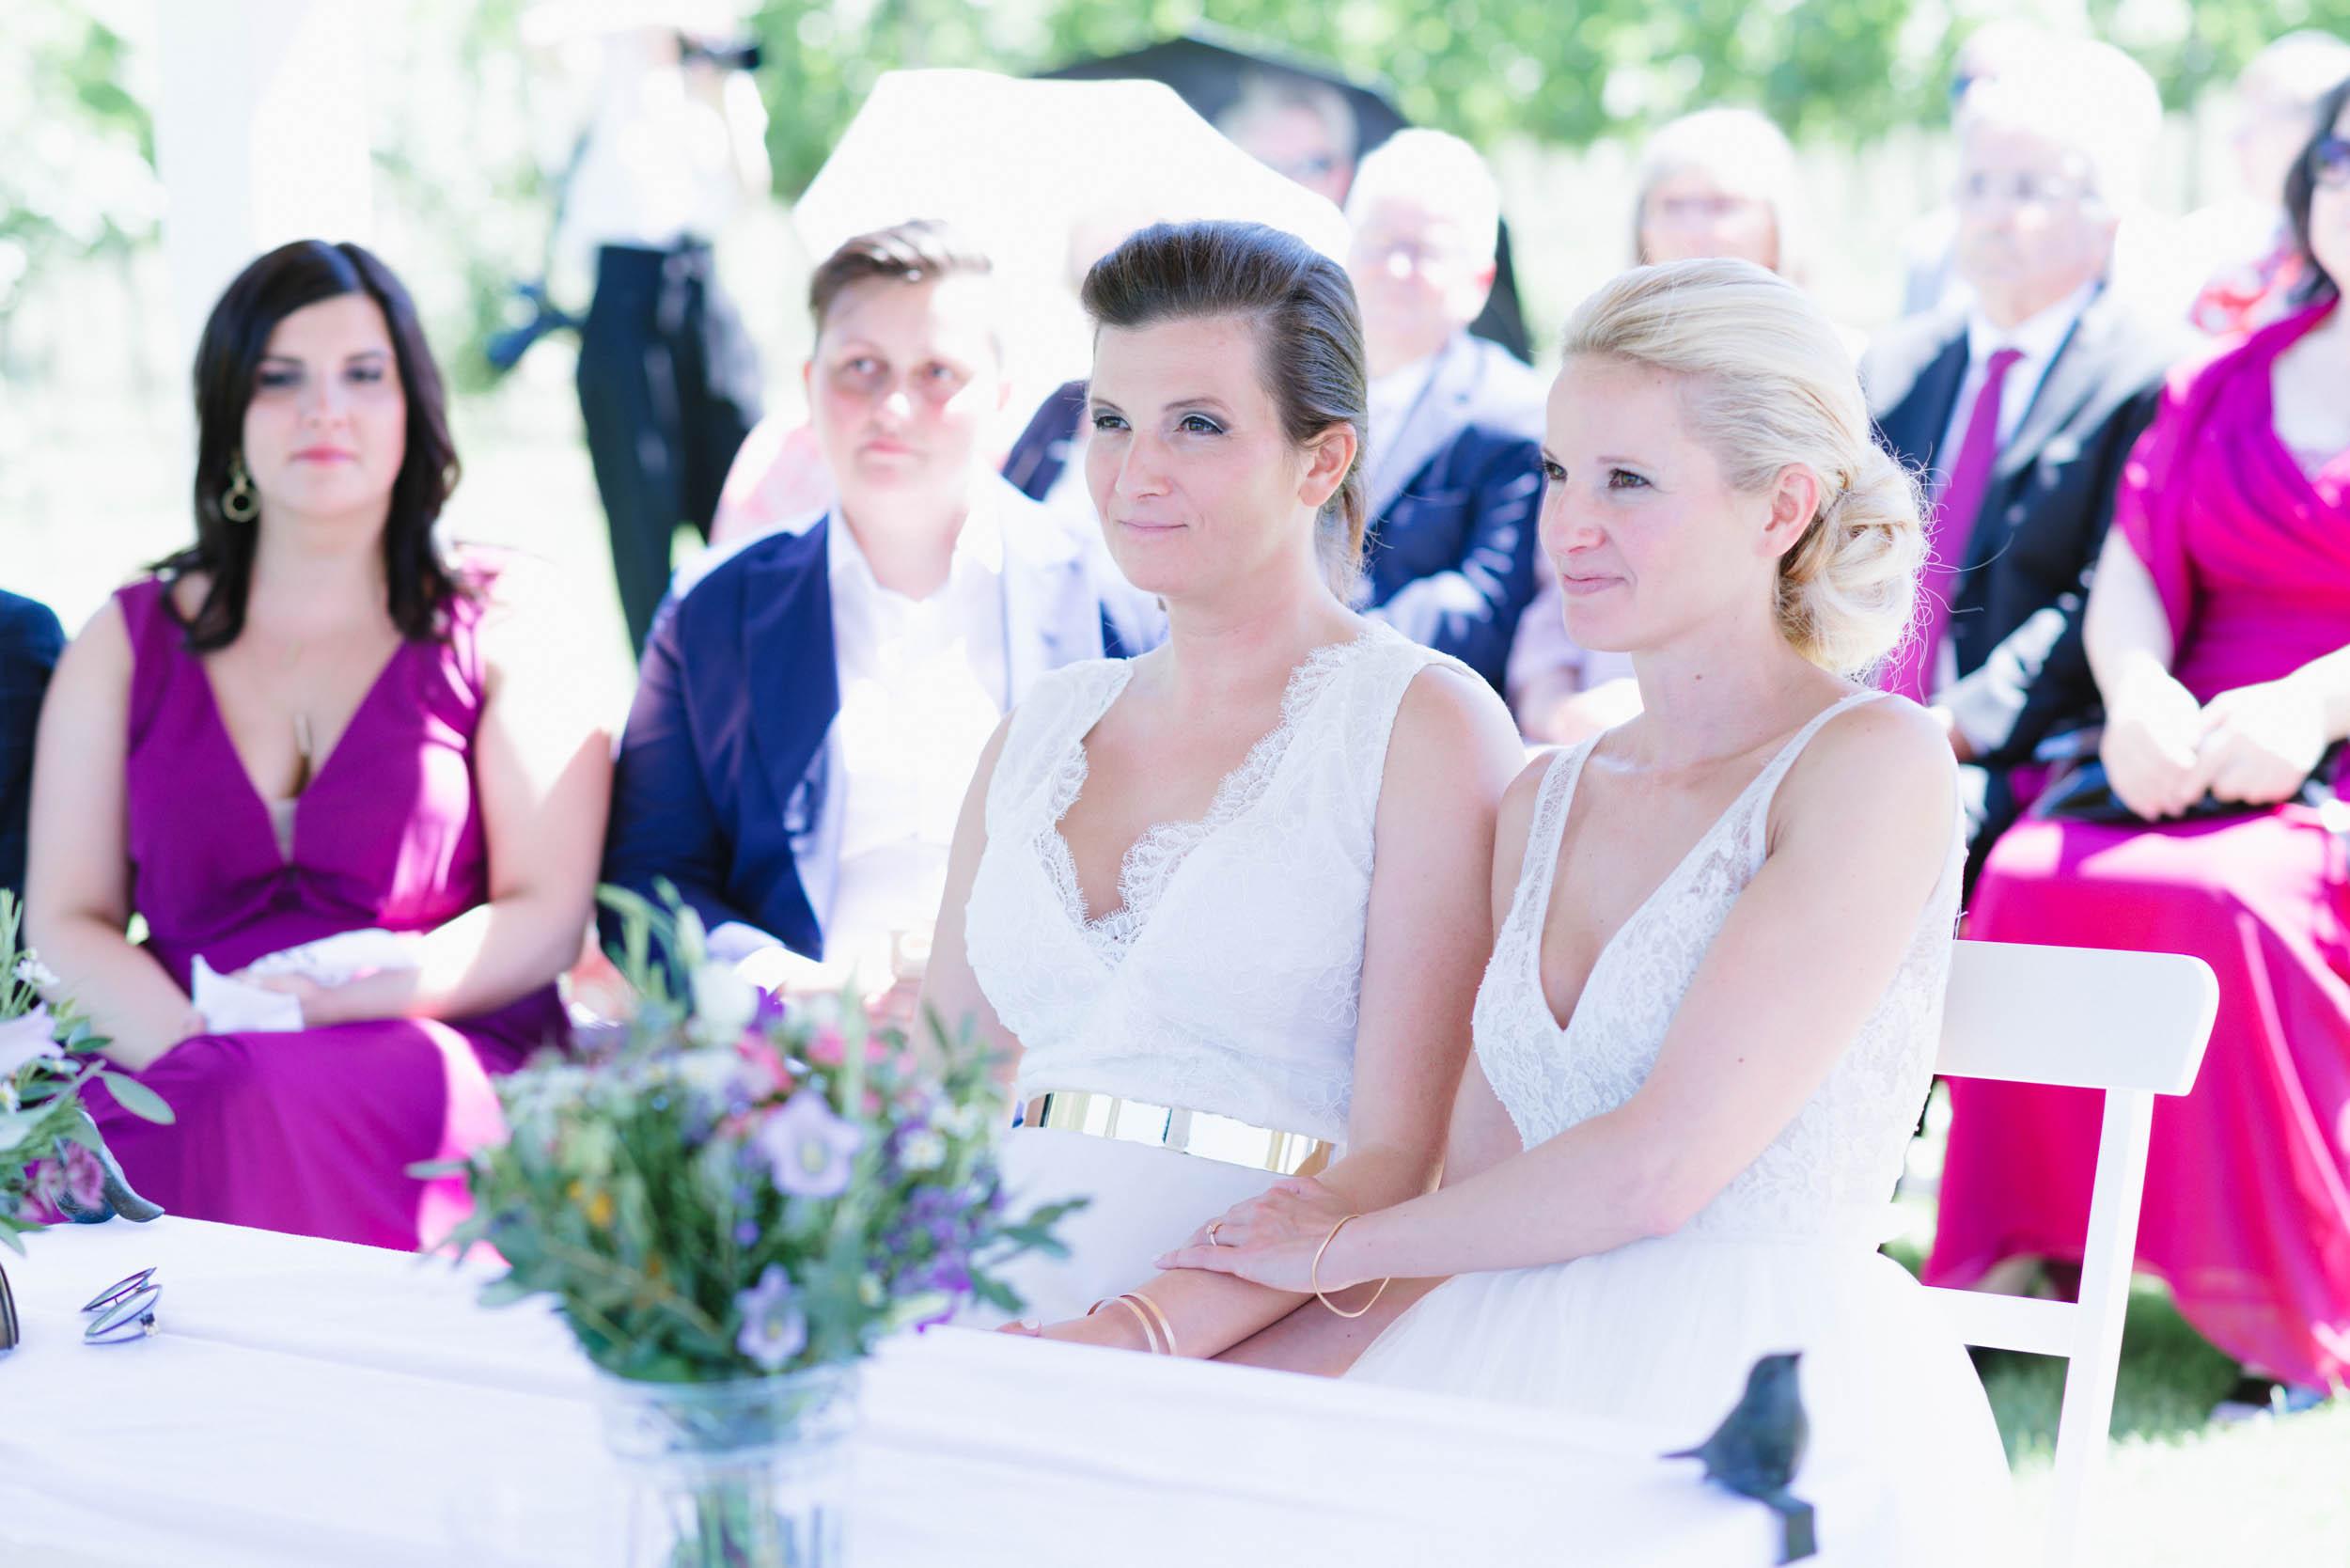 belle&sass__Lesbian Wedding in Austria_0048.jpg